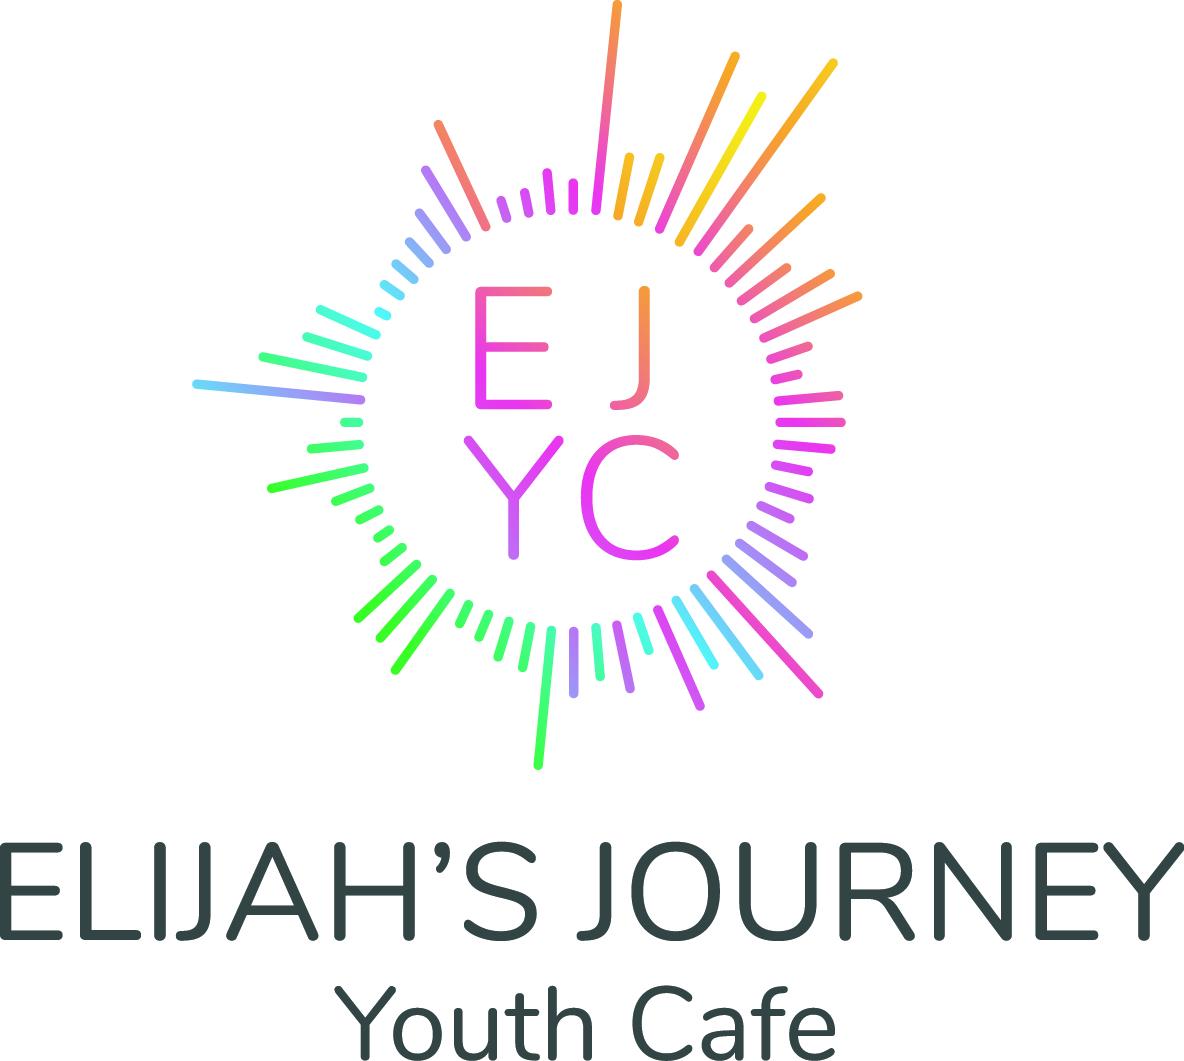 Elijah's Journey